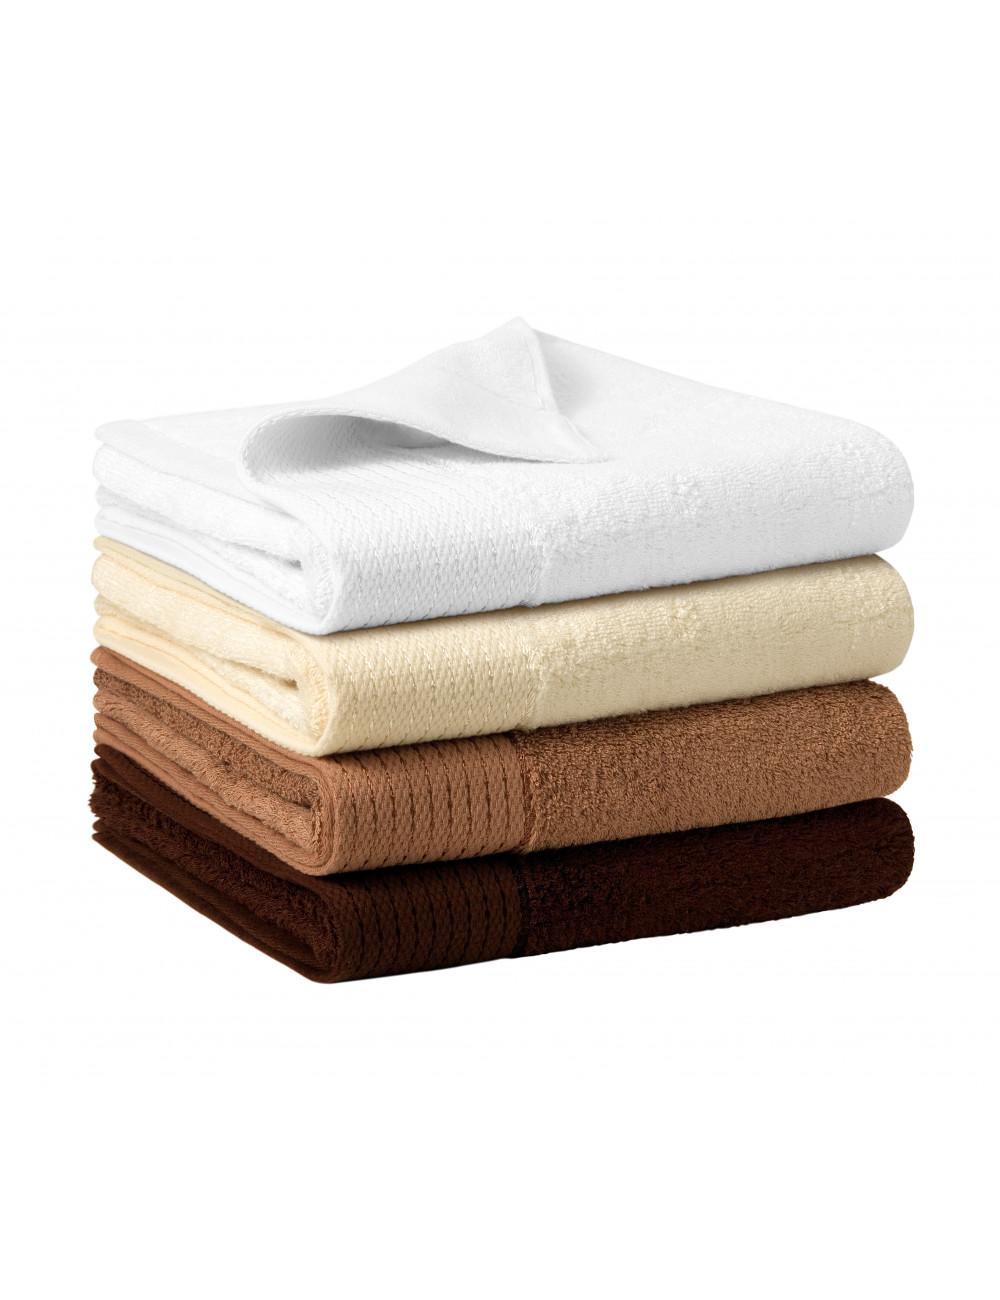 Adler MALFINIPREMIUM Ręcznik unisex Bamboo Towel 951 nugatowy